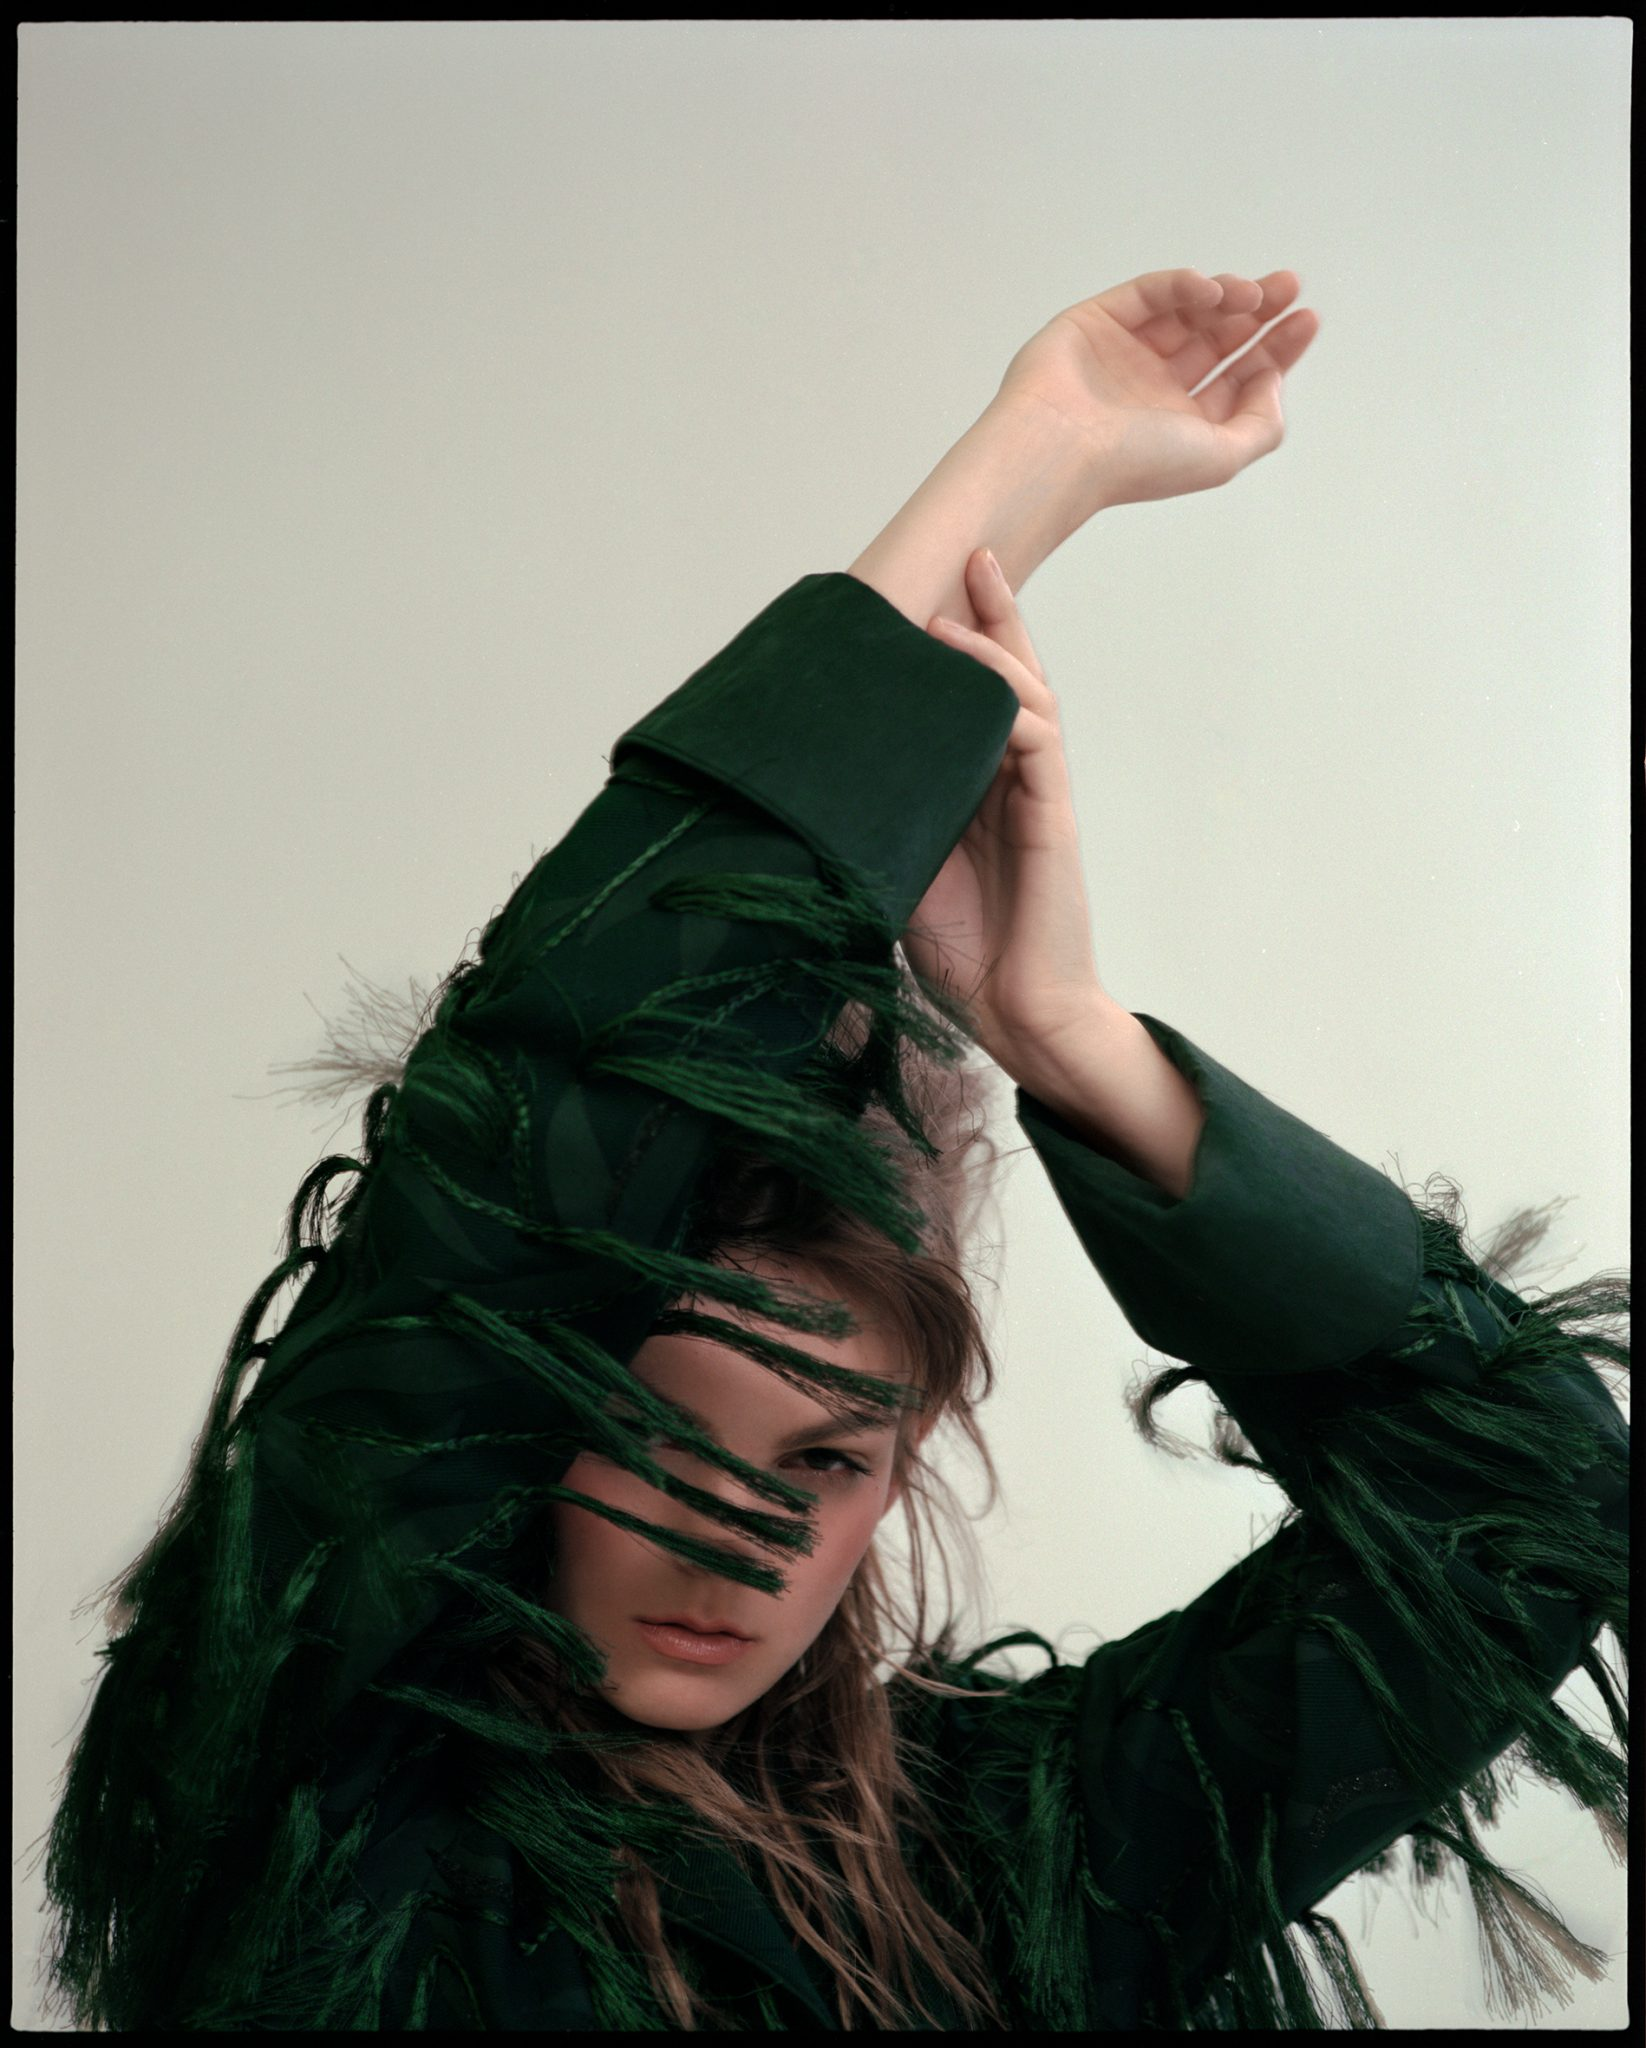 jungle-magazine-david-vail-oliver-vaughn